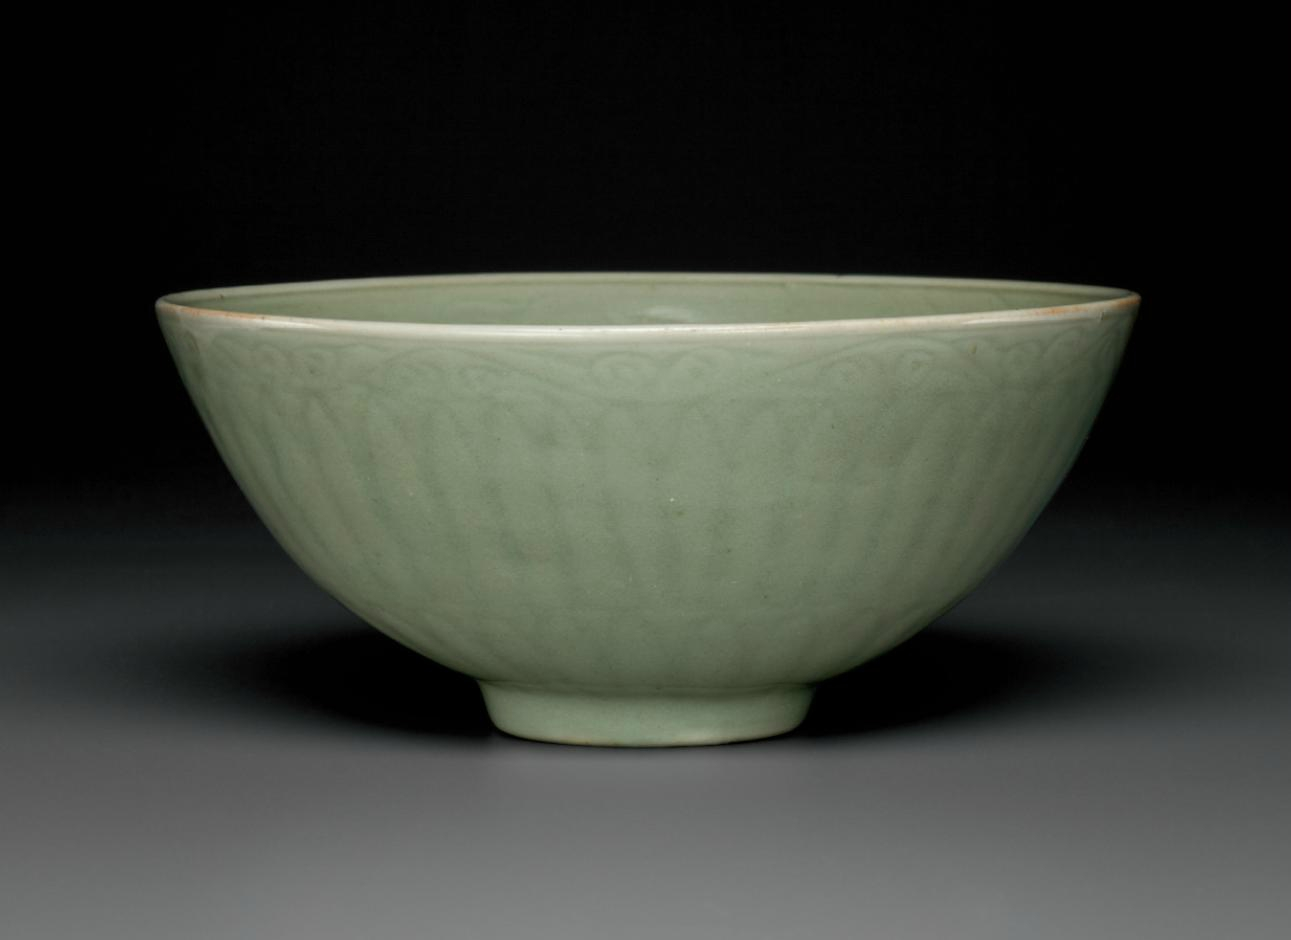 A Longquan celadon lianzibowl, Ming dynasty, 14th century